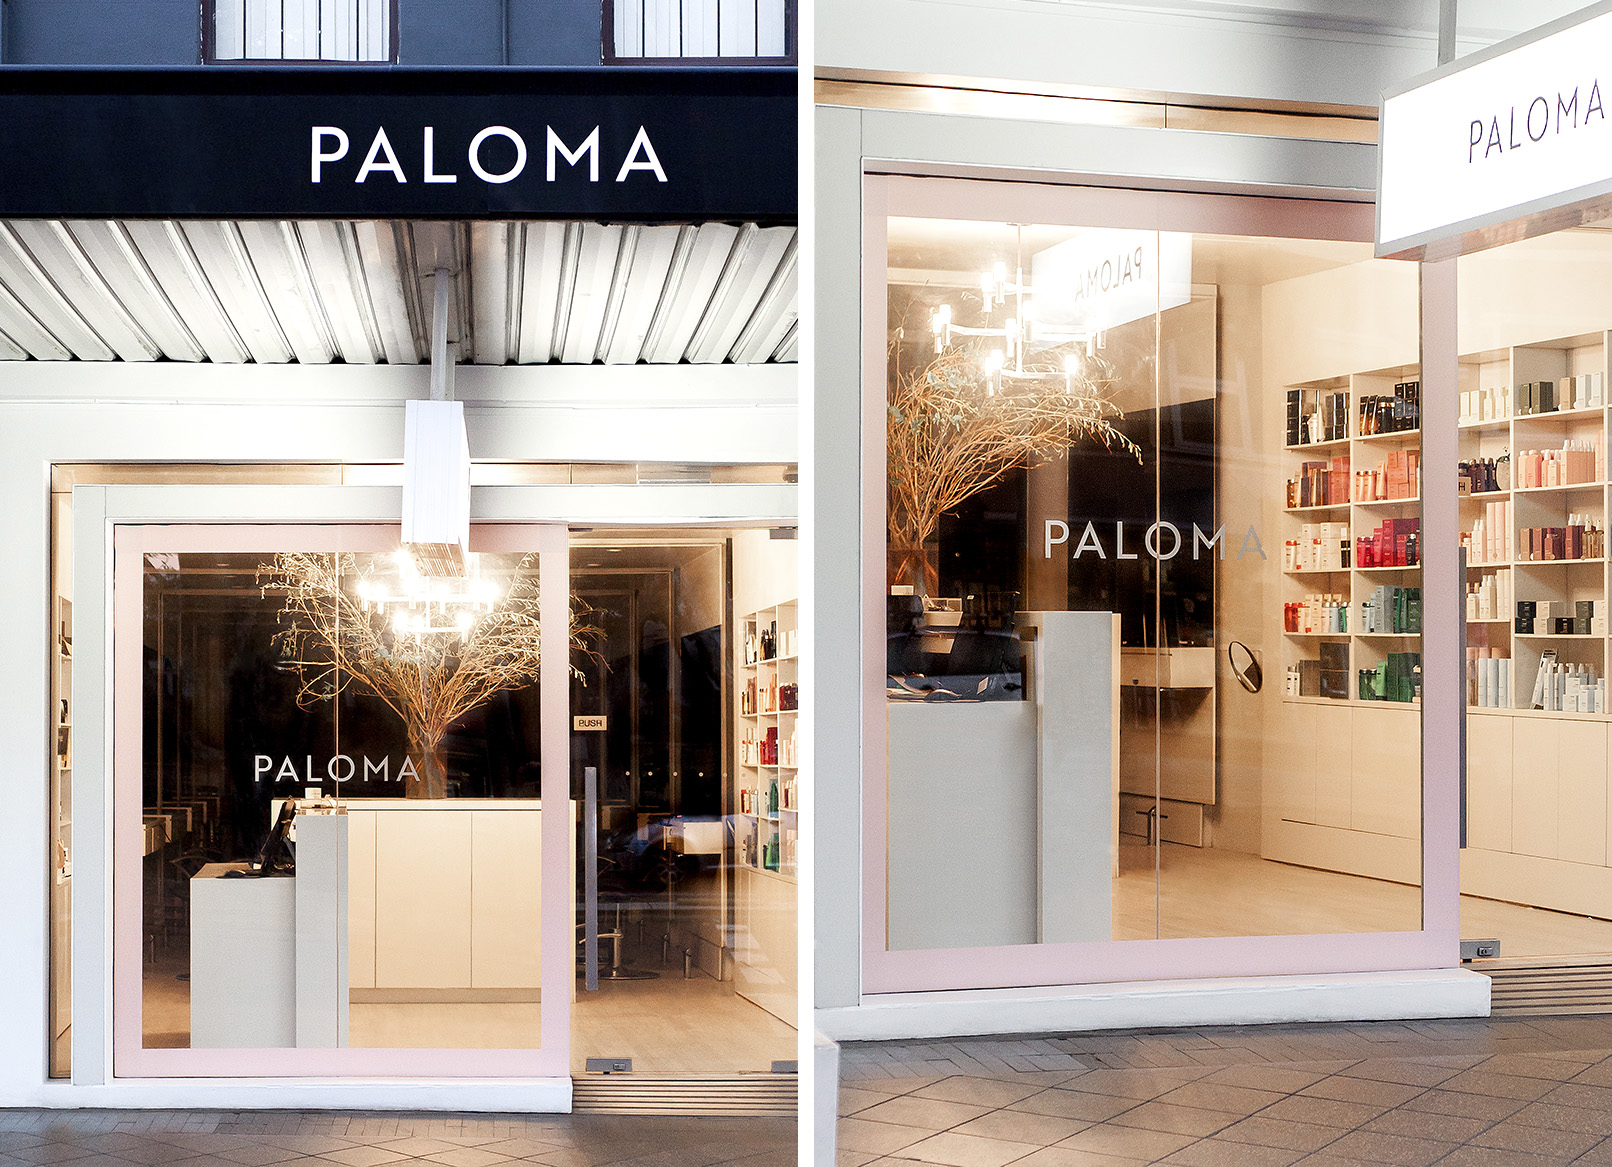 Paloma+Storefront+2.jpg